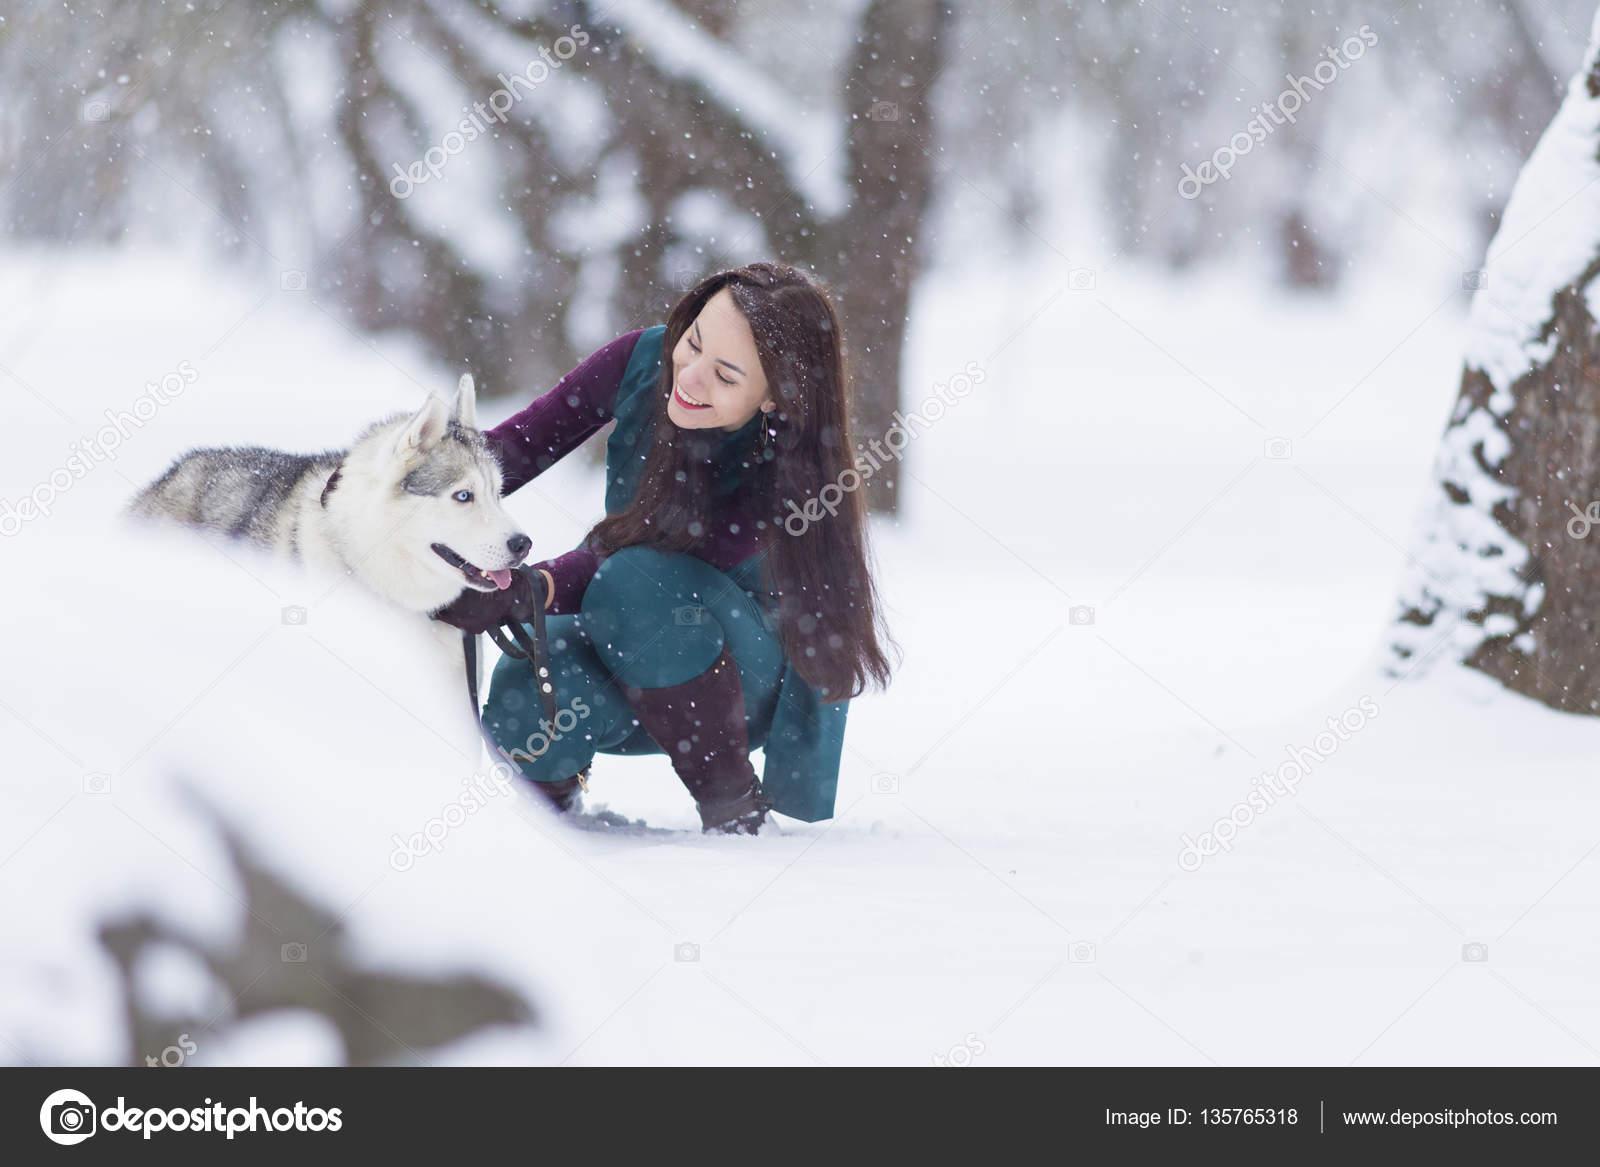 378d90a17013 Τα κατοικίδια έννοιες και ιδέες. Χαρούμενος και χαμογελαστός Καυκάσιος  μελαχρινή γυναίκα παίζει με σκυλιά Husky